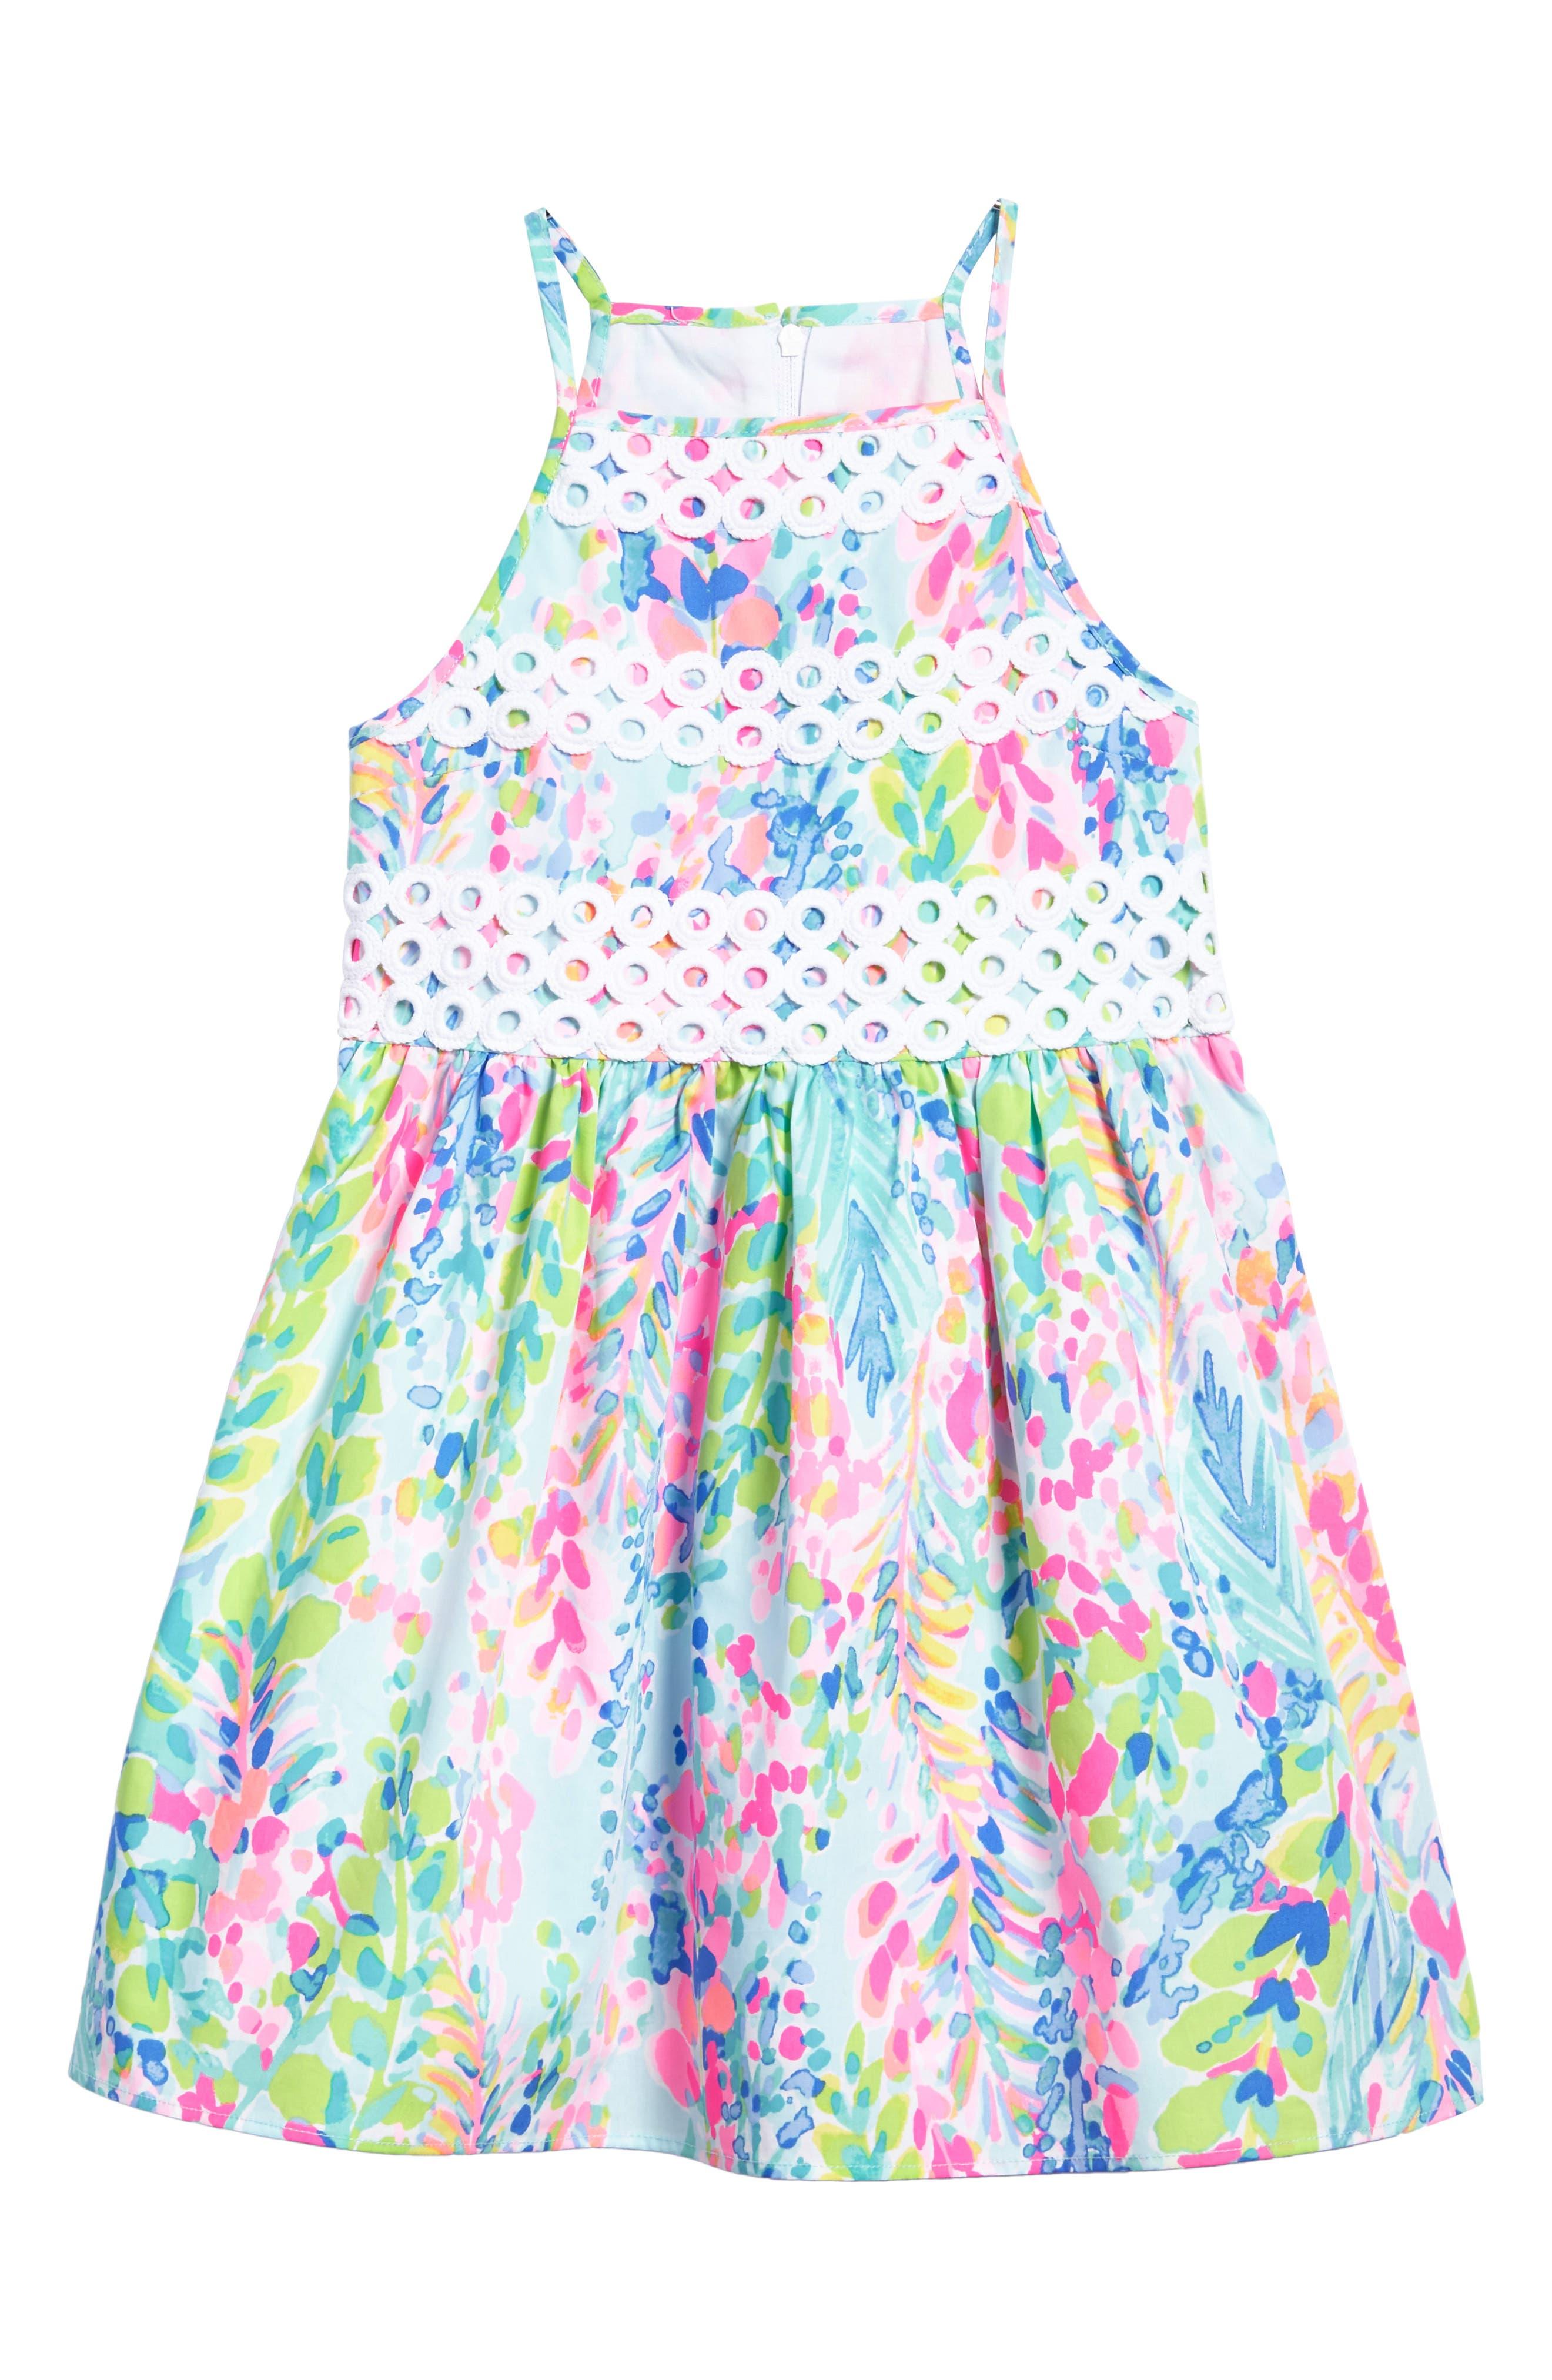 Main Image - Lilly Pulitzer® Elize Fit & Flare Dress (Toddler Girls, Little Girls & Big Girls)